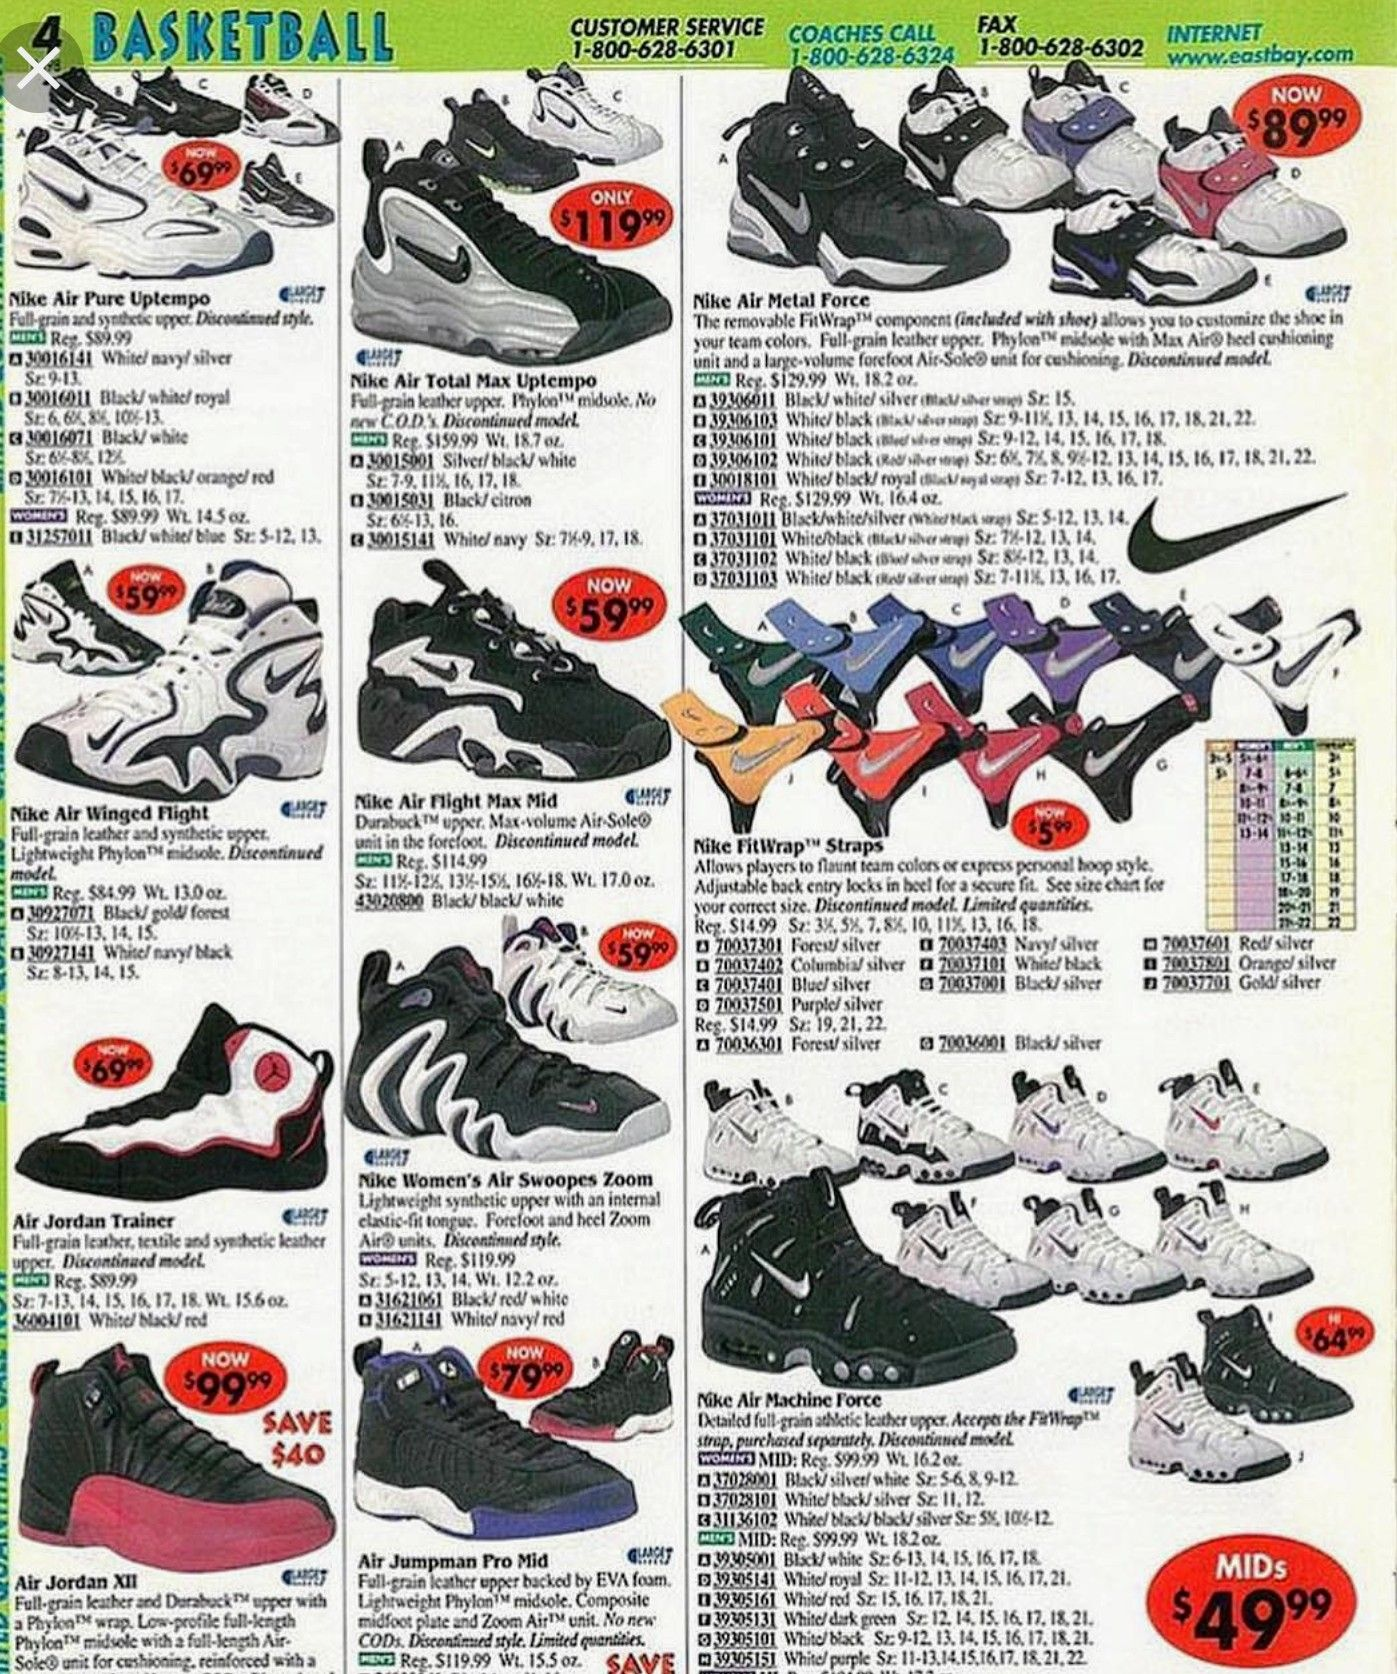 Jordan Air OlSchool Mens Basketball Shoes